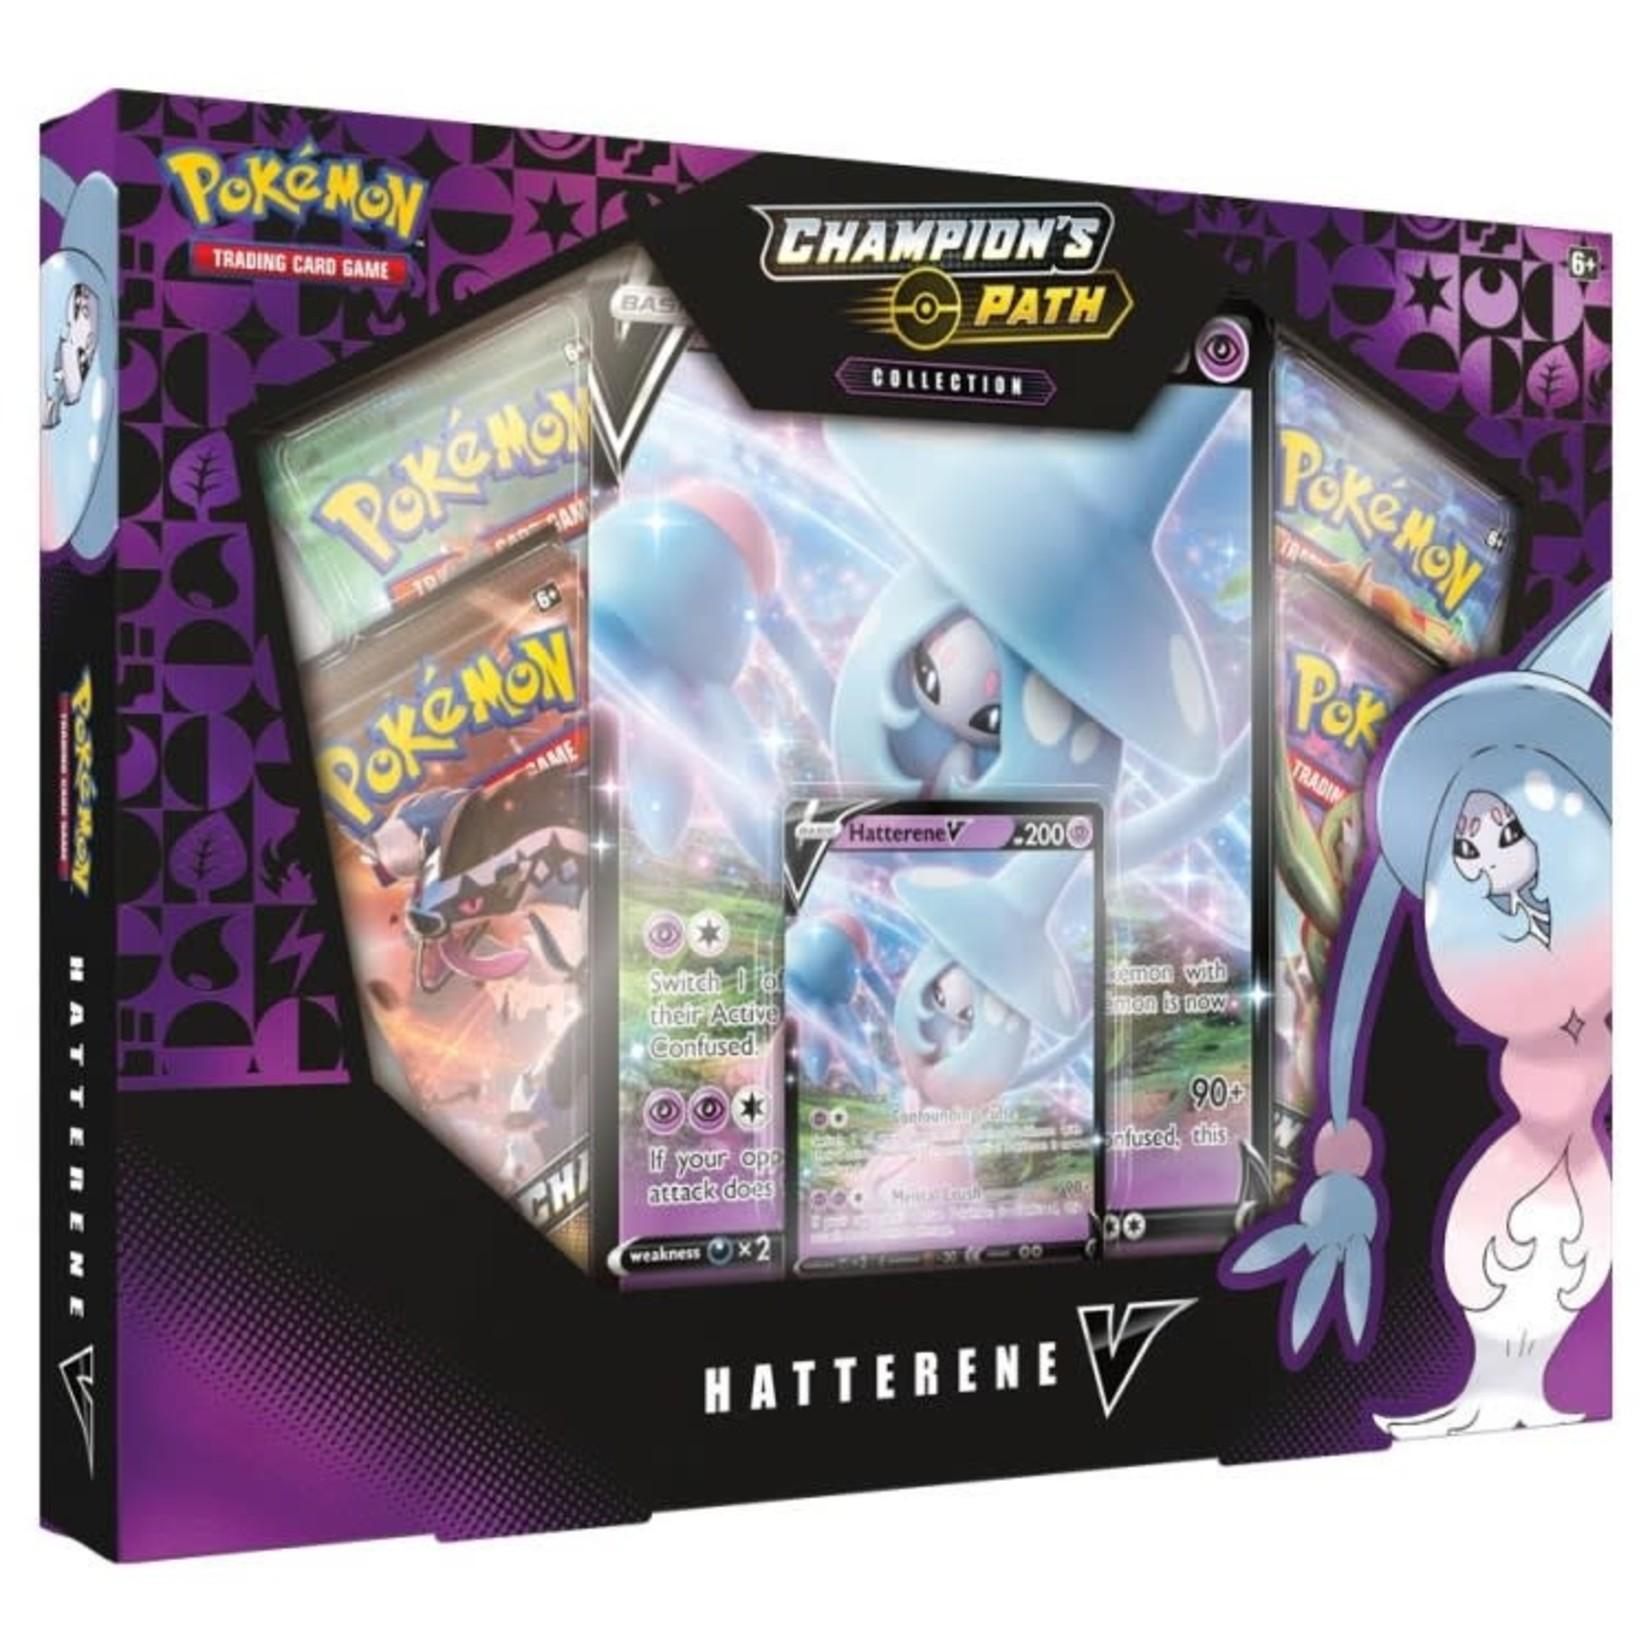 Pokemon International Pokémon TCG: Champion's Path Collection: Hatterene V